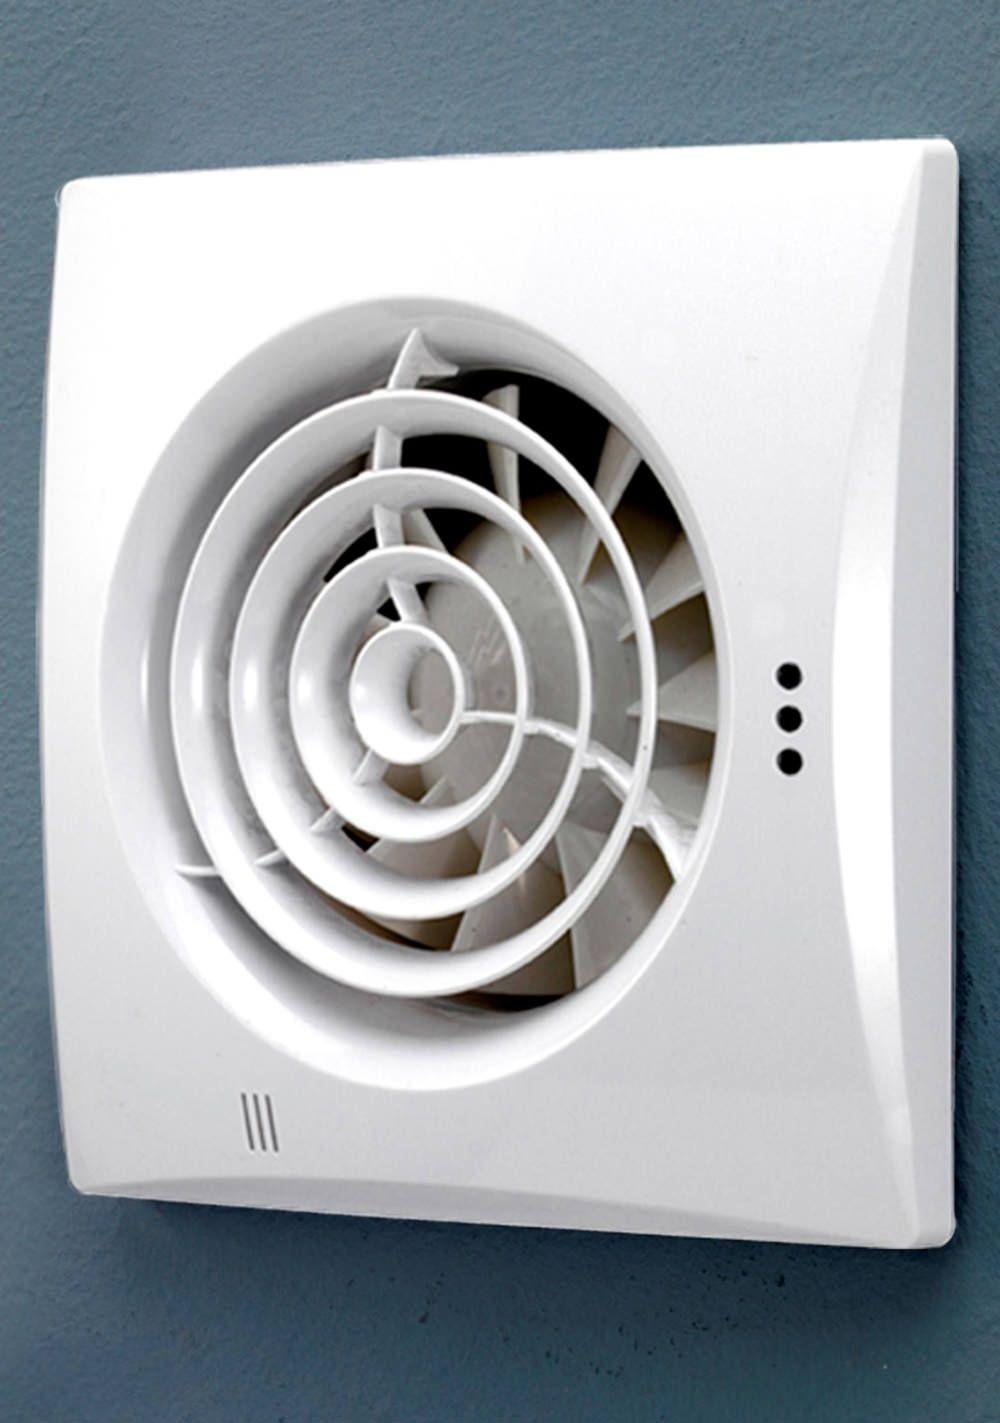 Humidity Sensor Bathroom Extractor Fan Bathroom Ideas - Humidity sensing bathroom fan for bathroom decor ideas